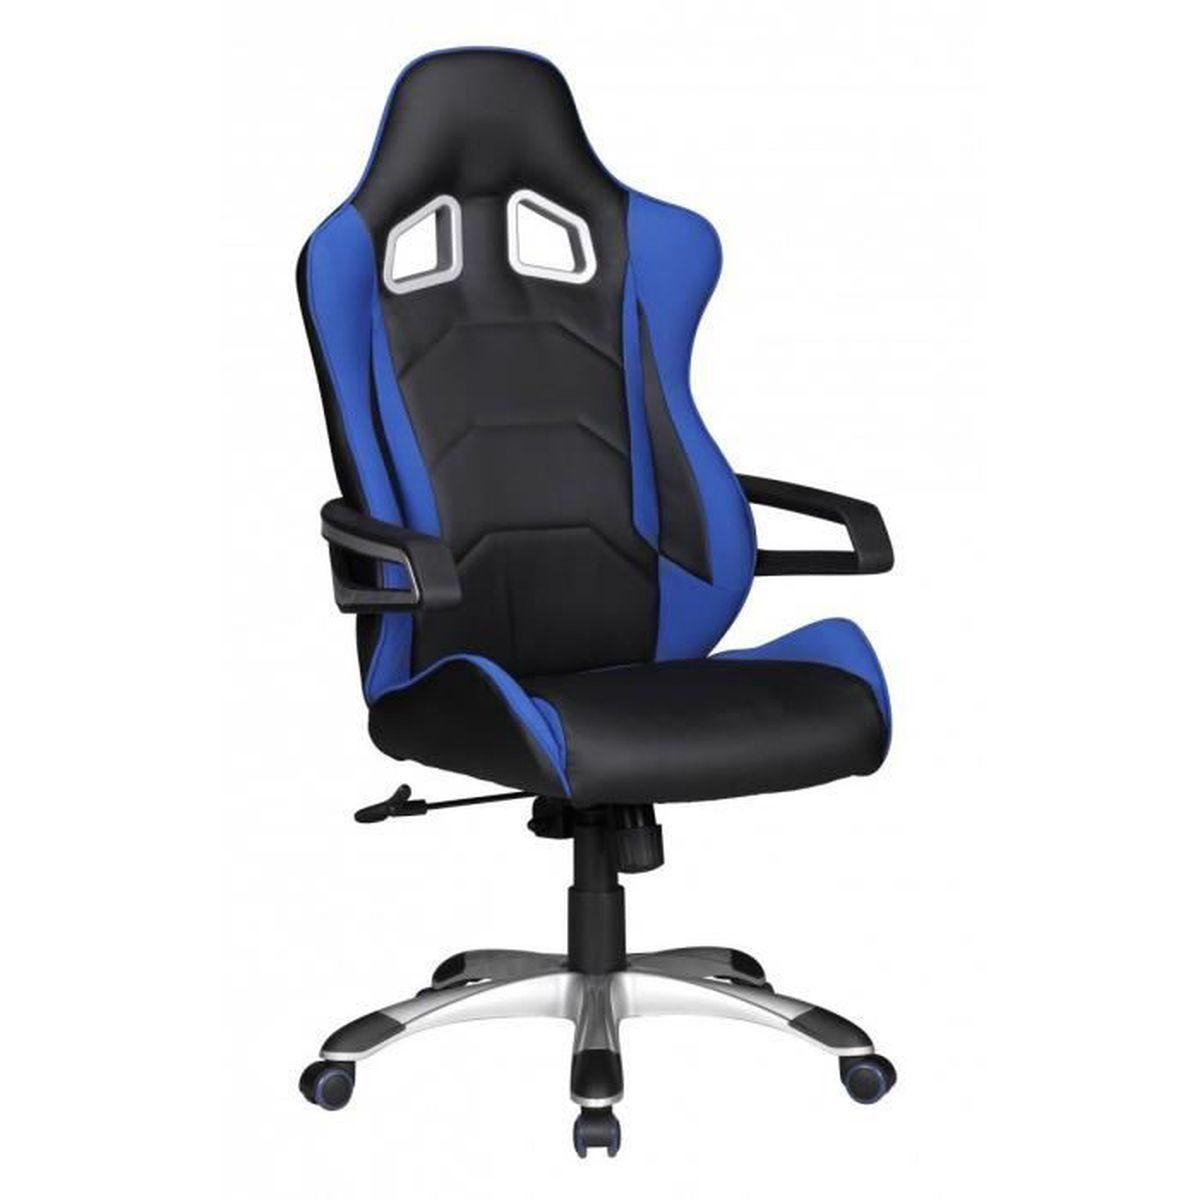 chaise de bureau speed bleu racing chefsessel racer chaise pivotante m canisme synchrone chaise. Black Bedroom Furniture Sets. Home Design Ideas